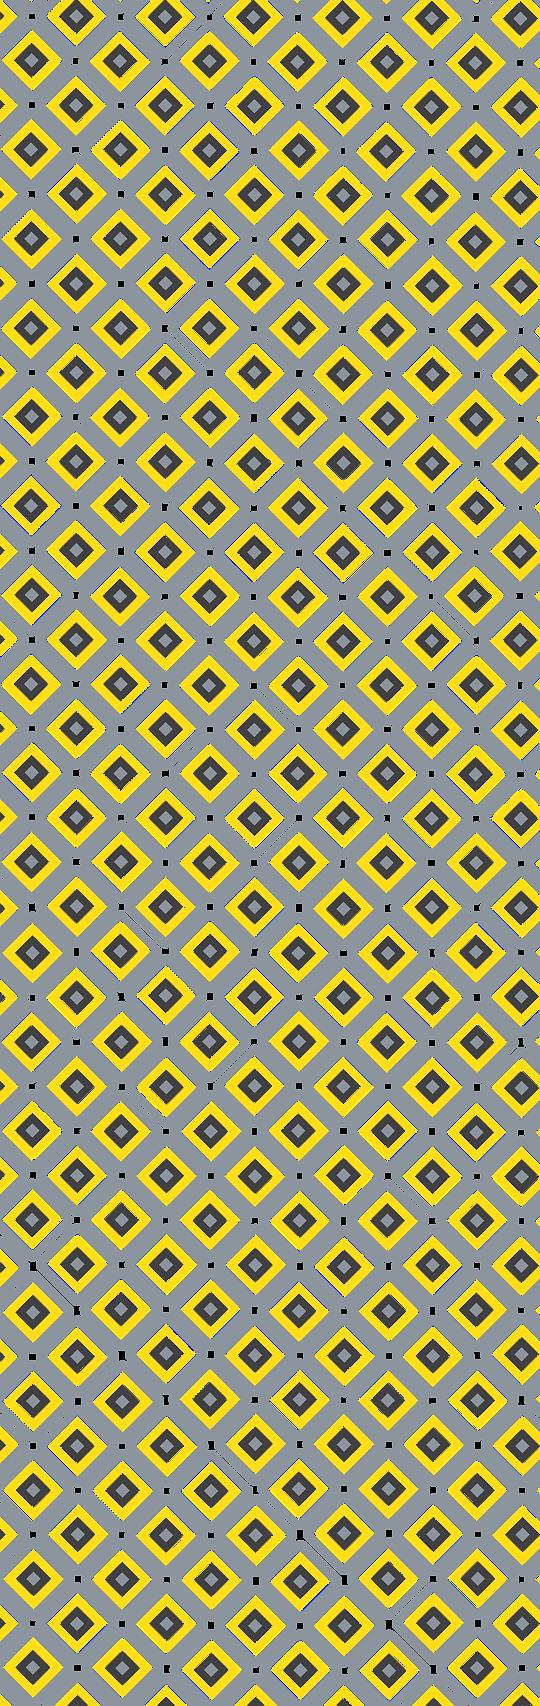 diamondpattern2-01.png